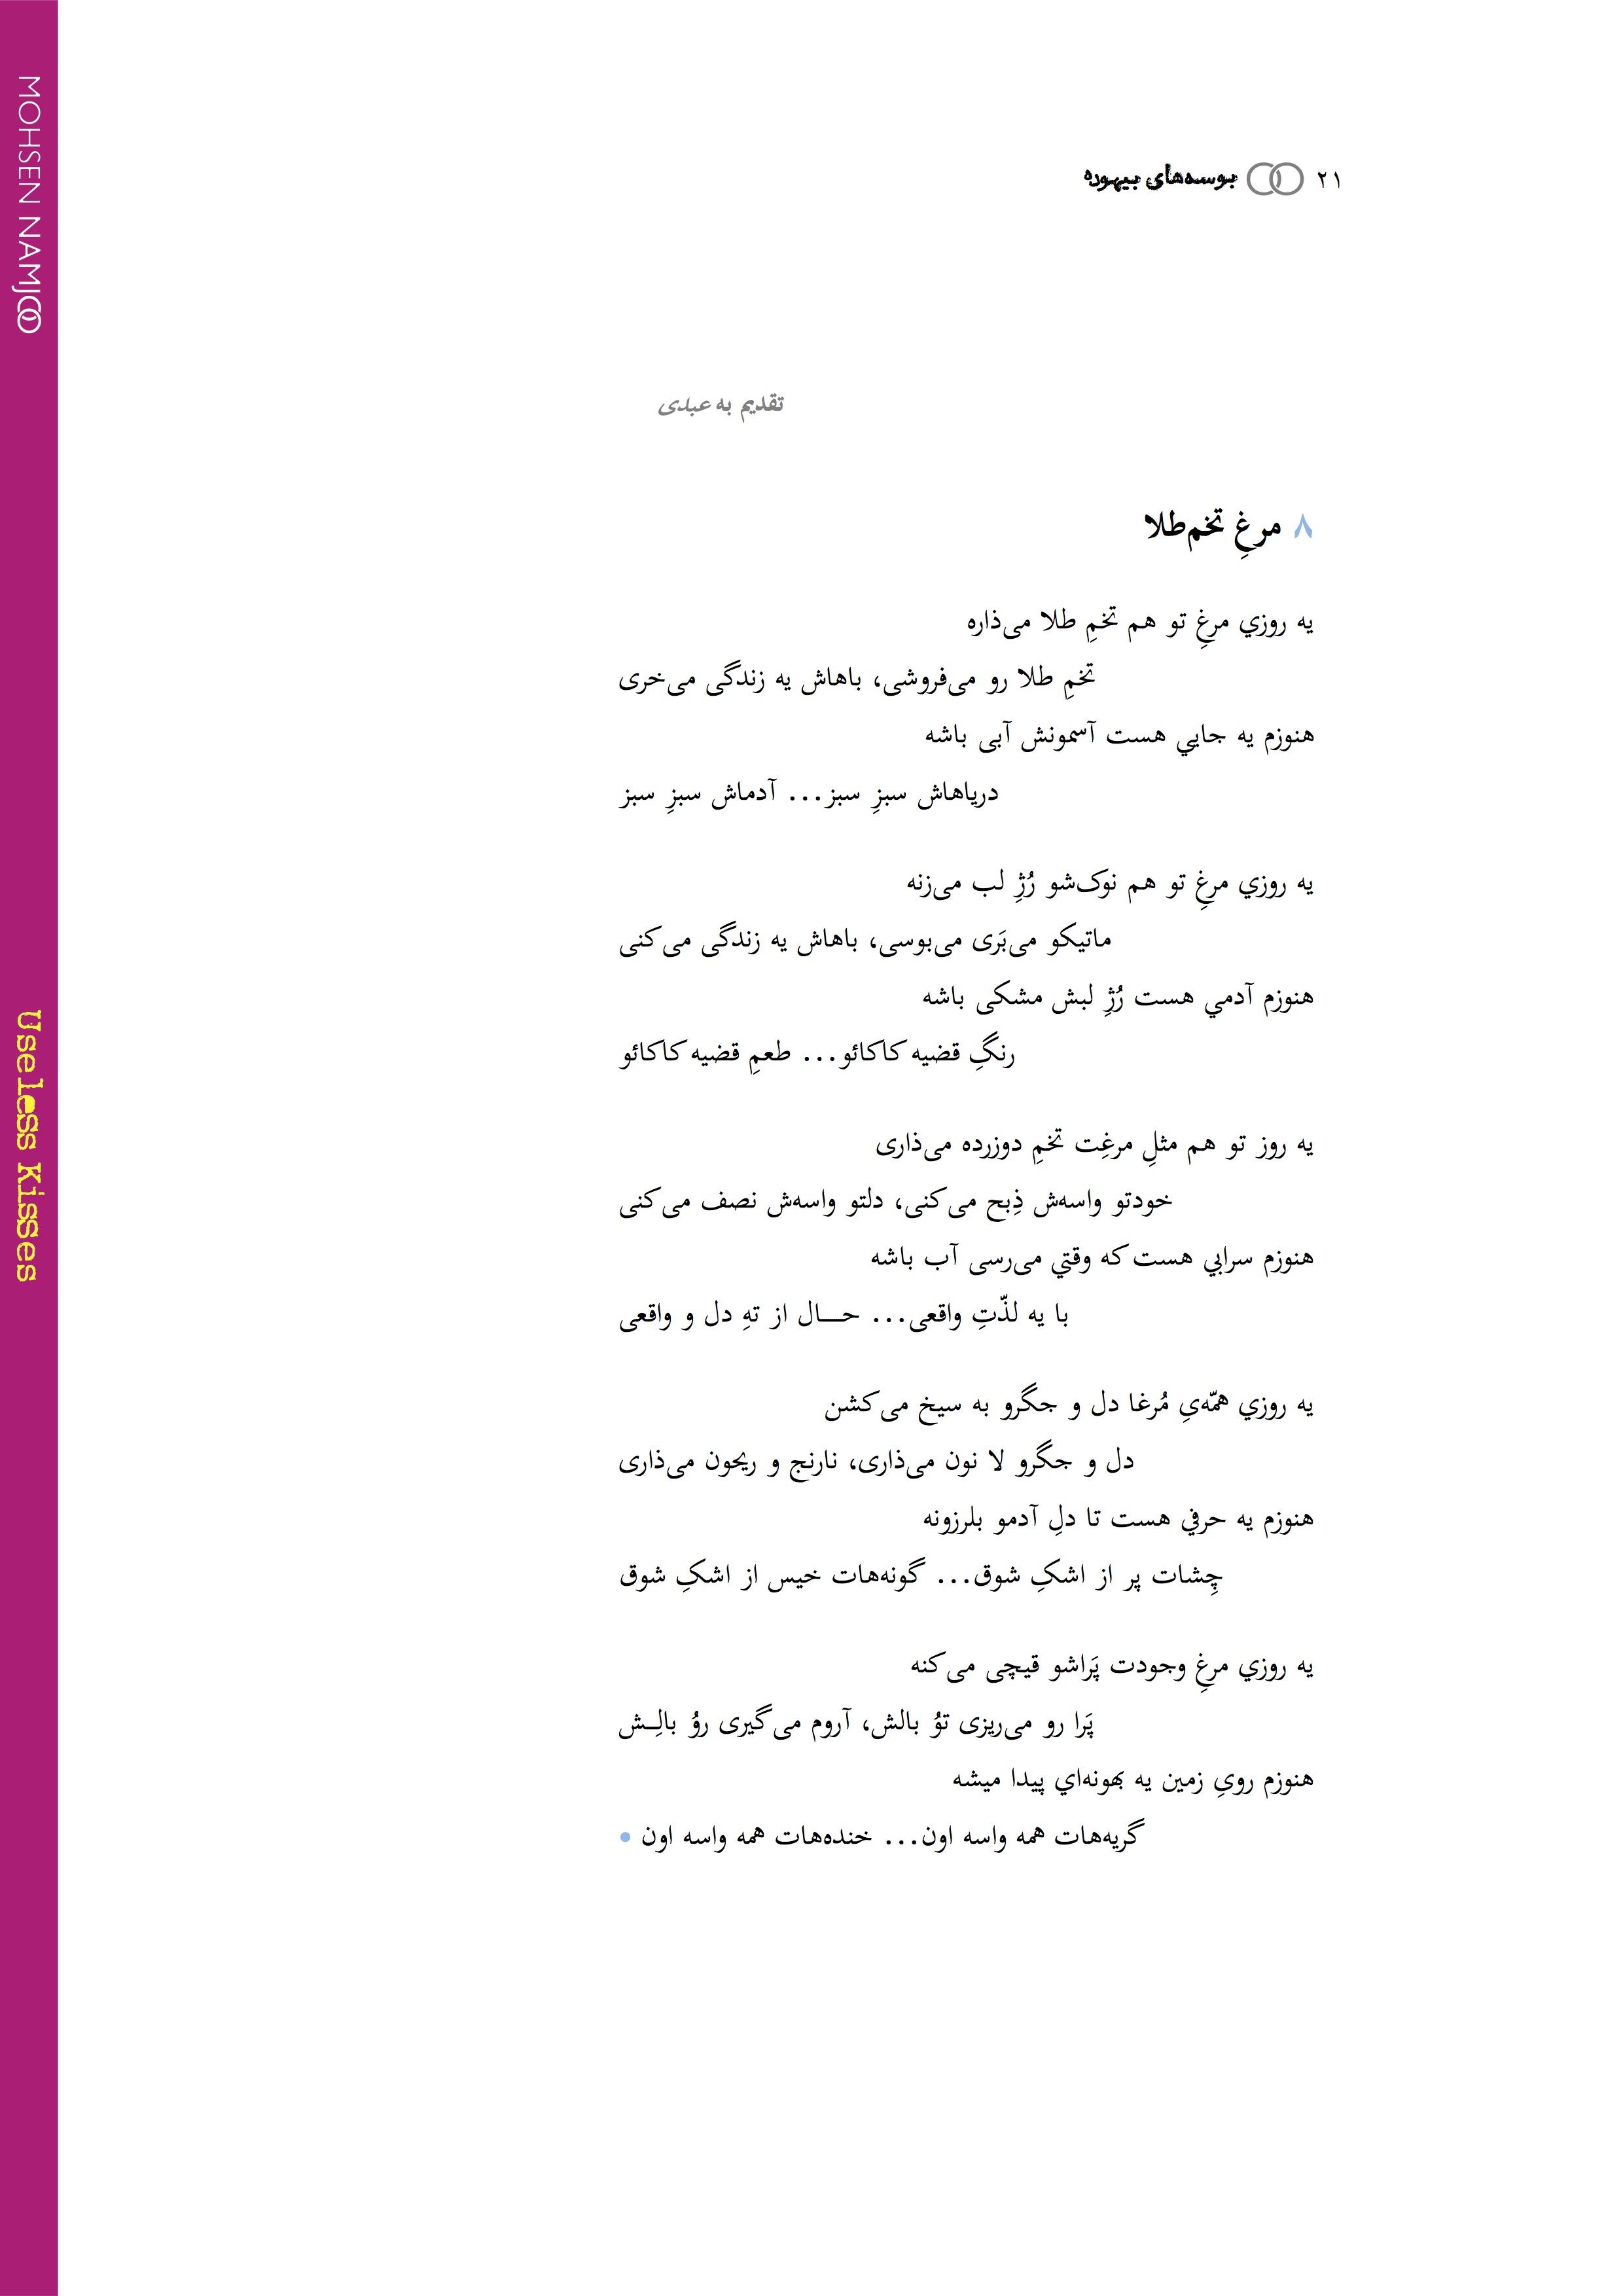 20Useless Kisses eBook (2nd Edition).jpg